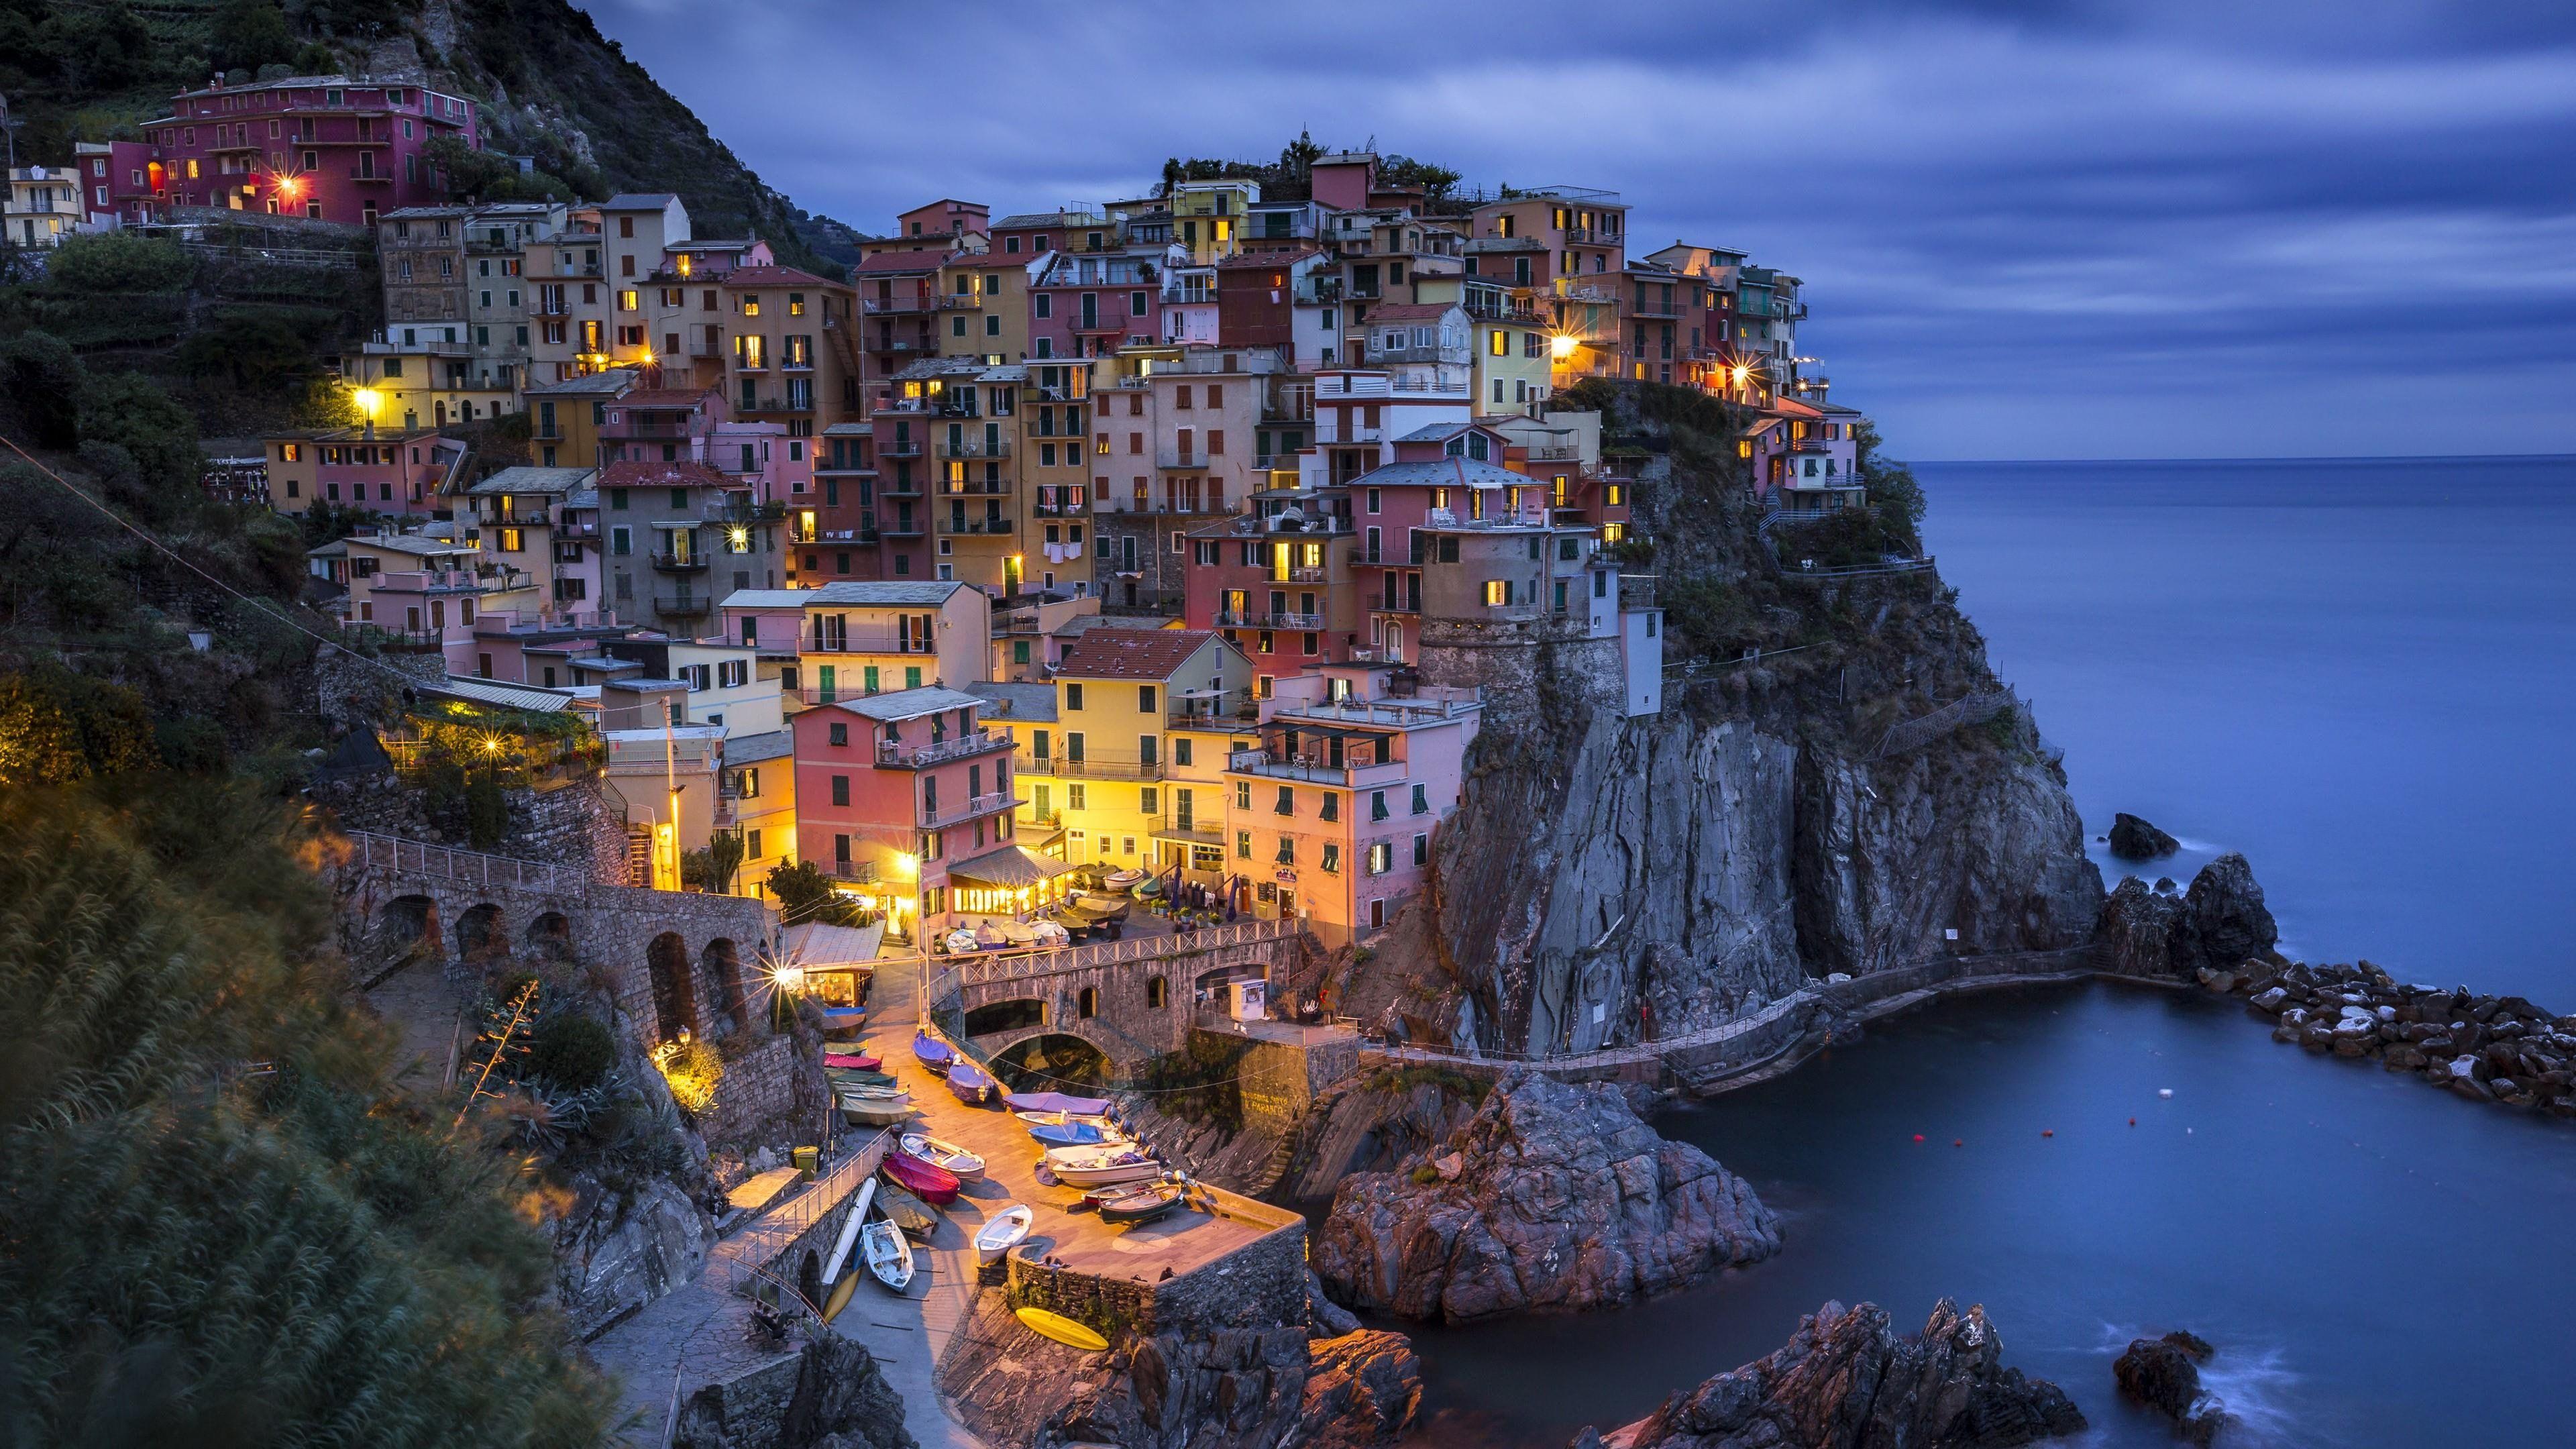 Village Coast Cinque Terre Europe Italy La Spezia Liguria Cliff Sea Landscape Manarola Tourism Cityscape Terrain Ni La Spezia Cinque Terre Tourism